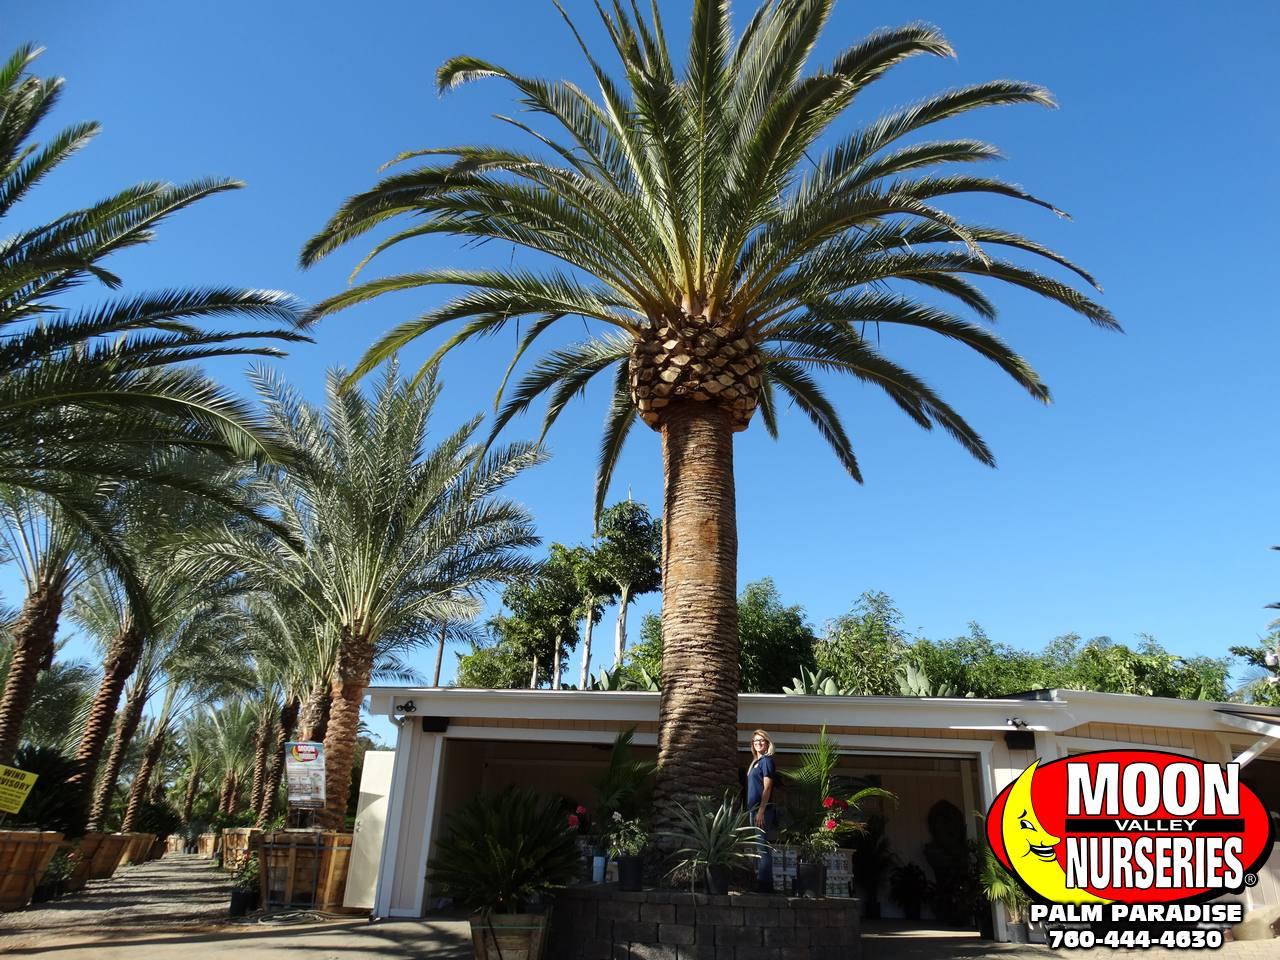 canary_island_date_palms-1